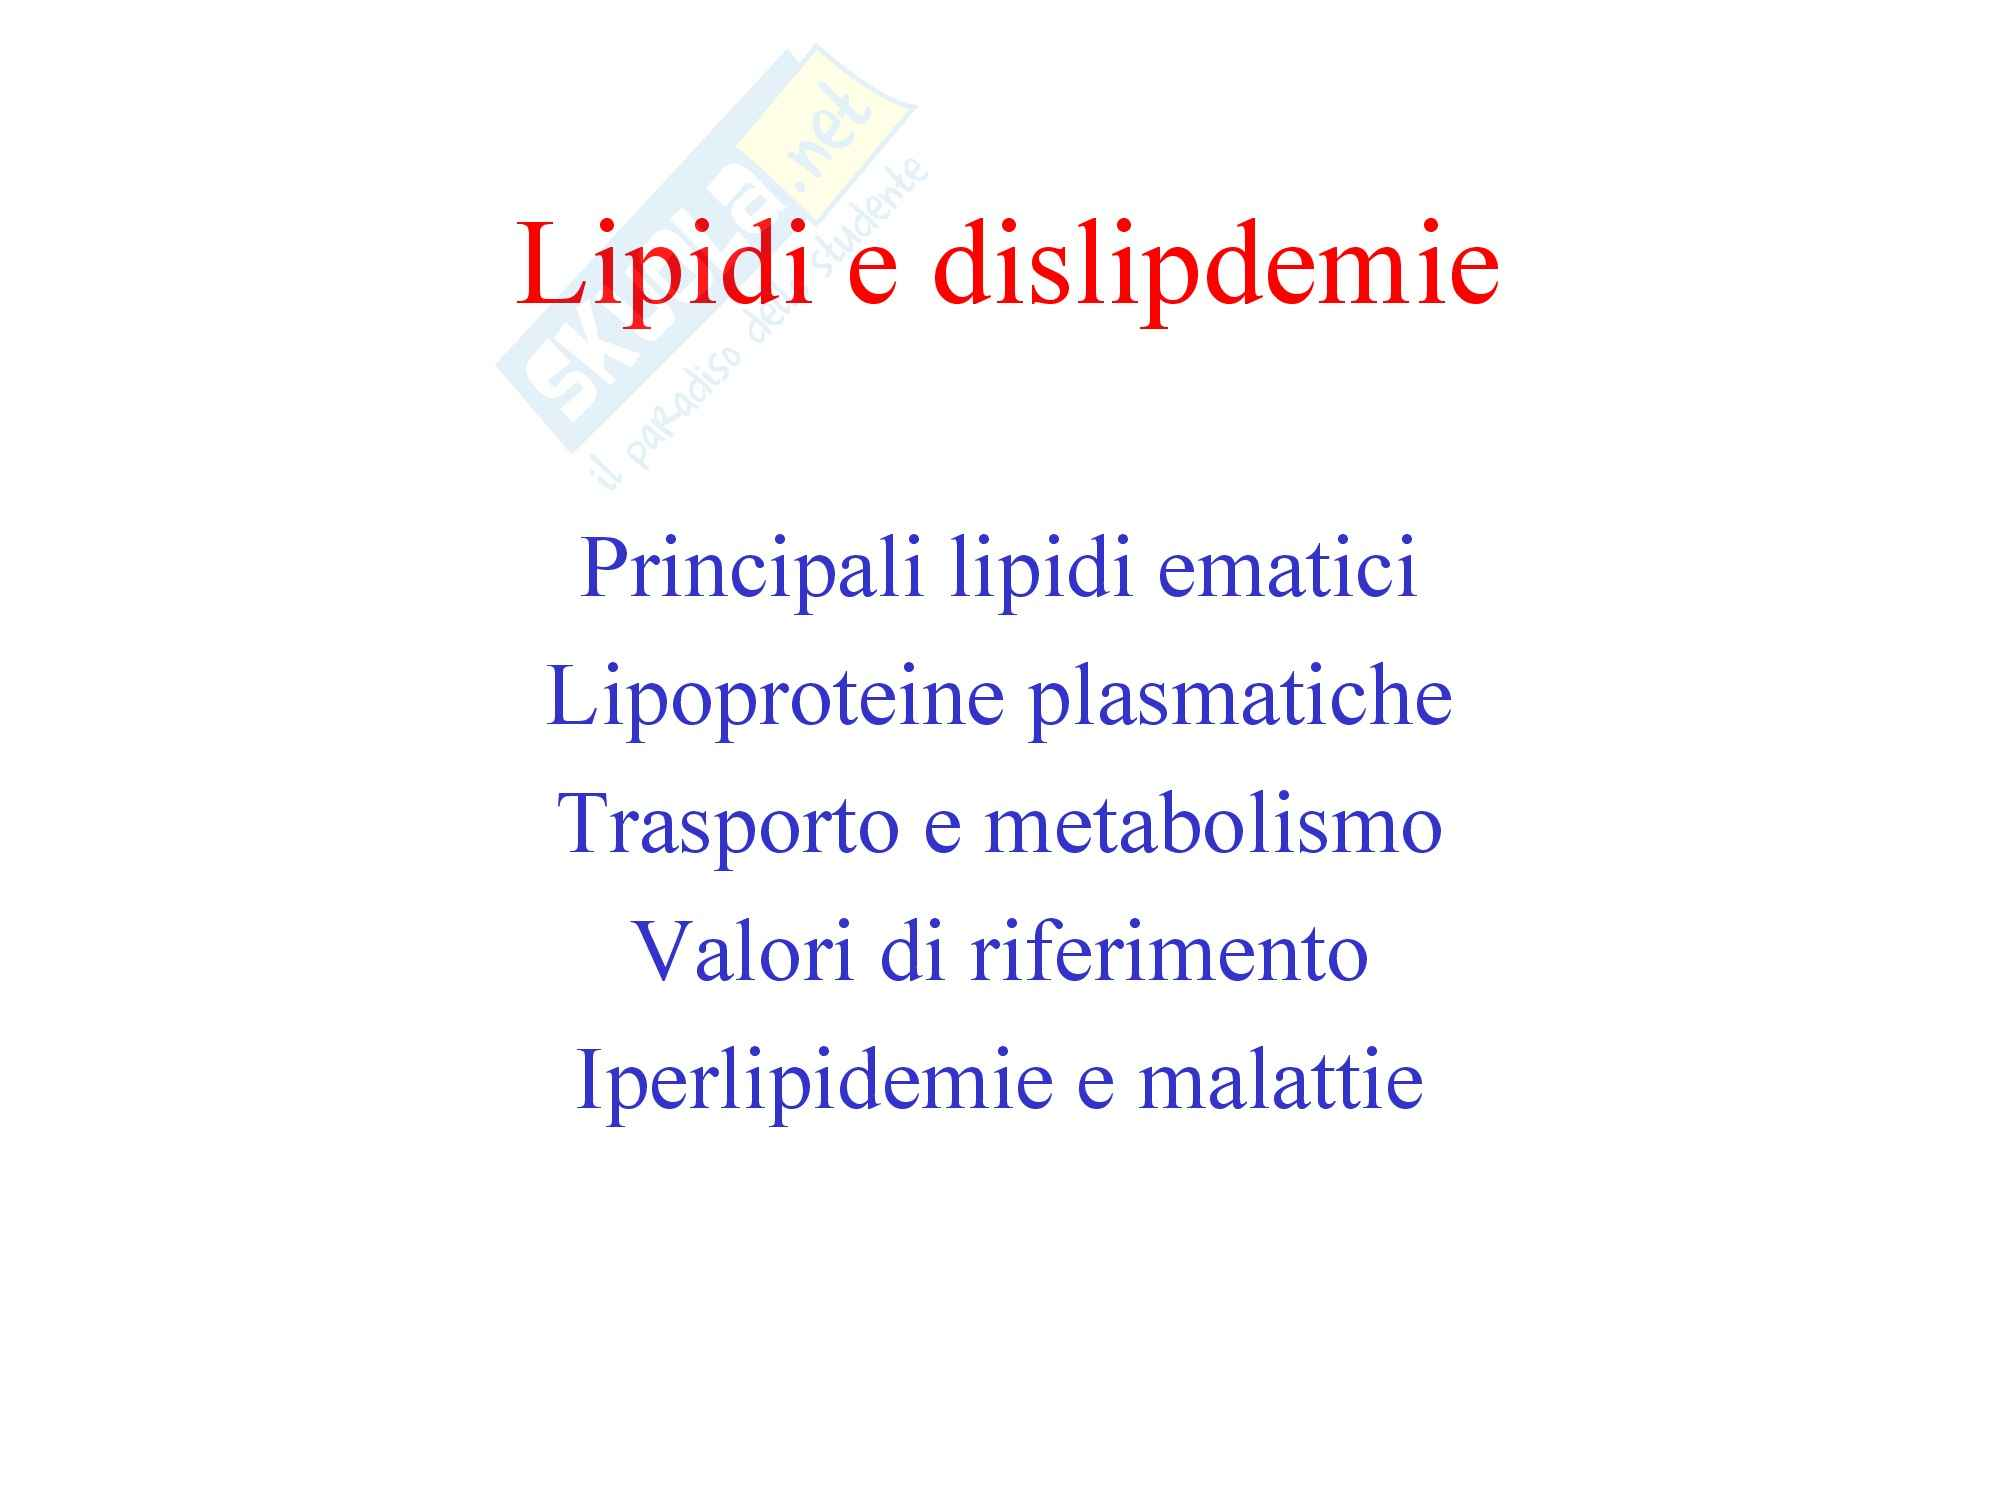 Biochimica Clinica - Lipidi